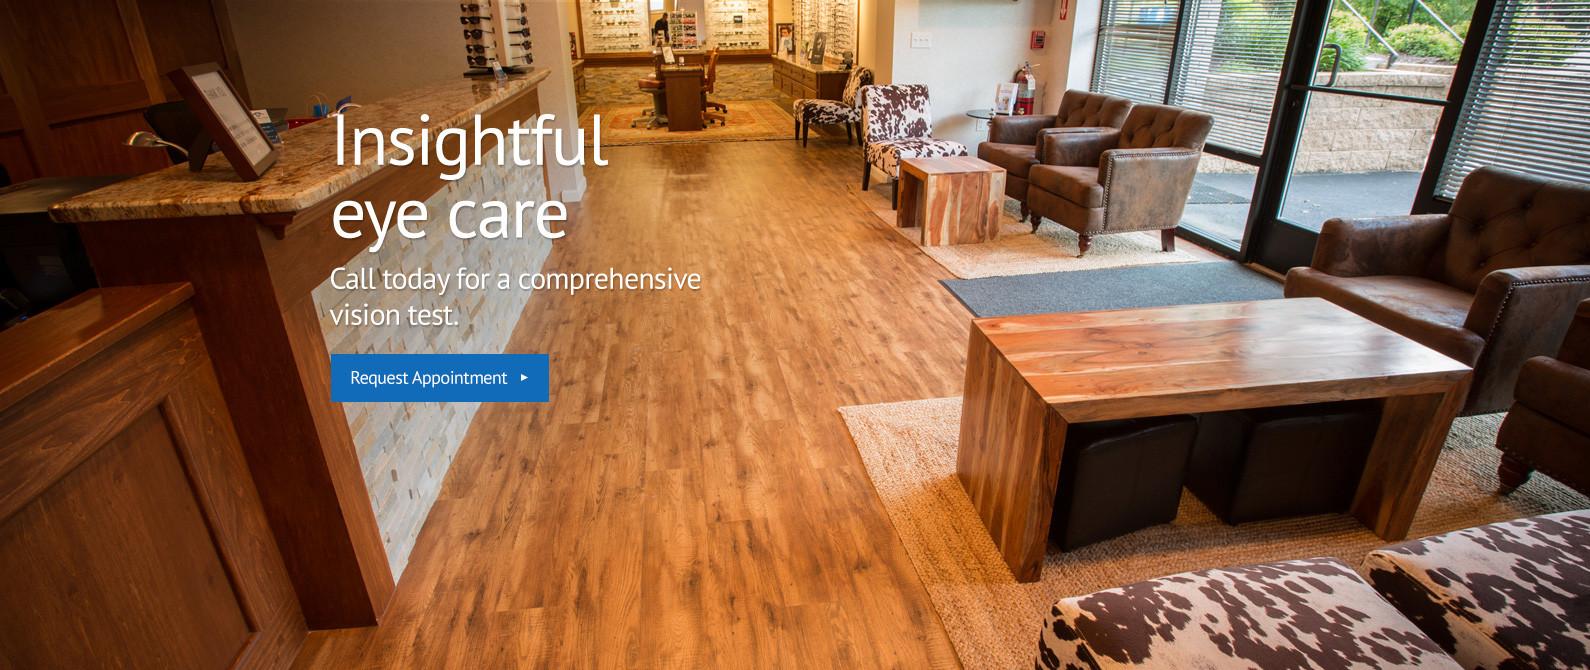 pg model hardwood flooring reviews of seraly eye care associates optometry in mcmurray pa usa home inside banner slide3